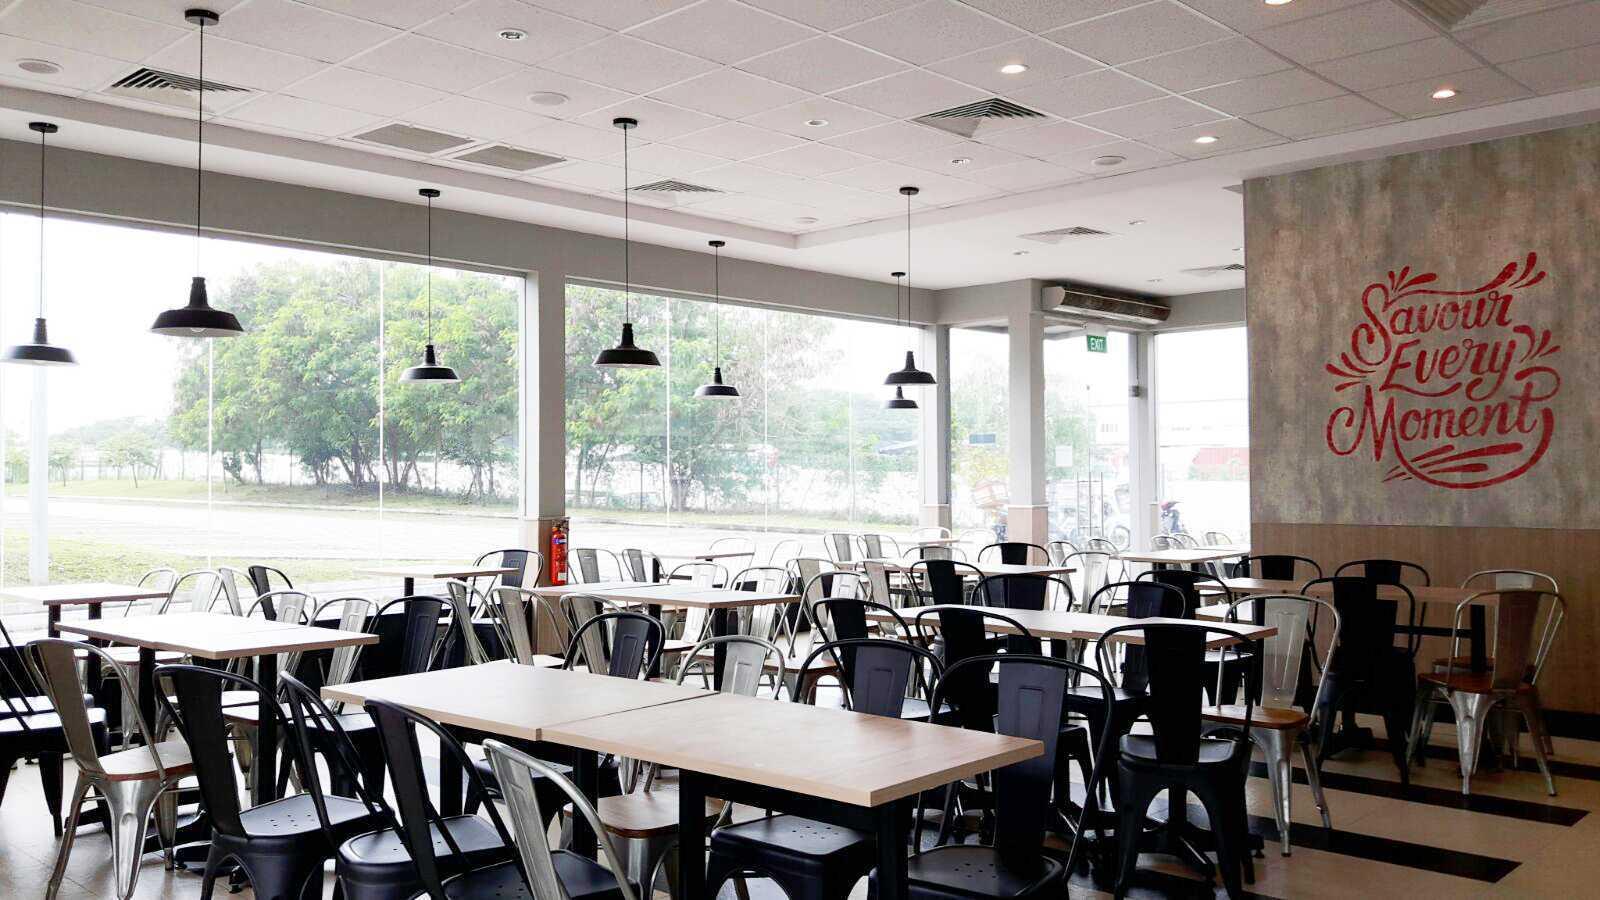 Minimmax Interiors Pte Ltd Kfc Punggol  East  60 Punggol E, Singapore 828824 60 Punggol E, Singapore 828824 Dining Area Modern  38685